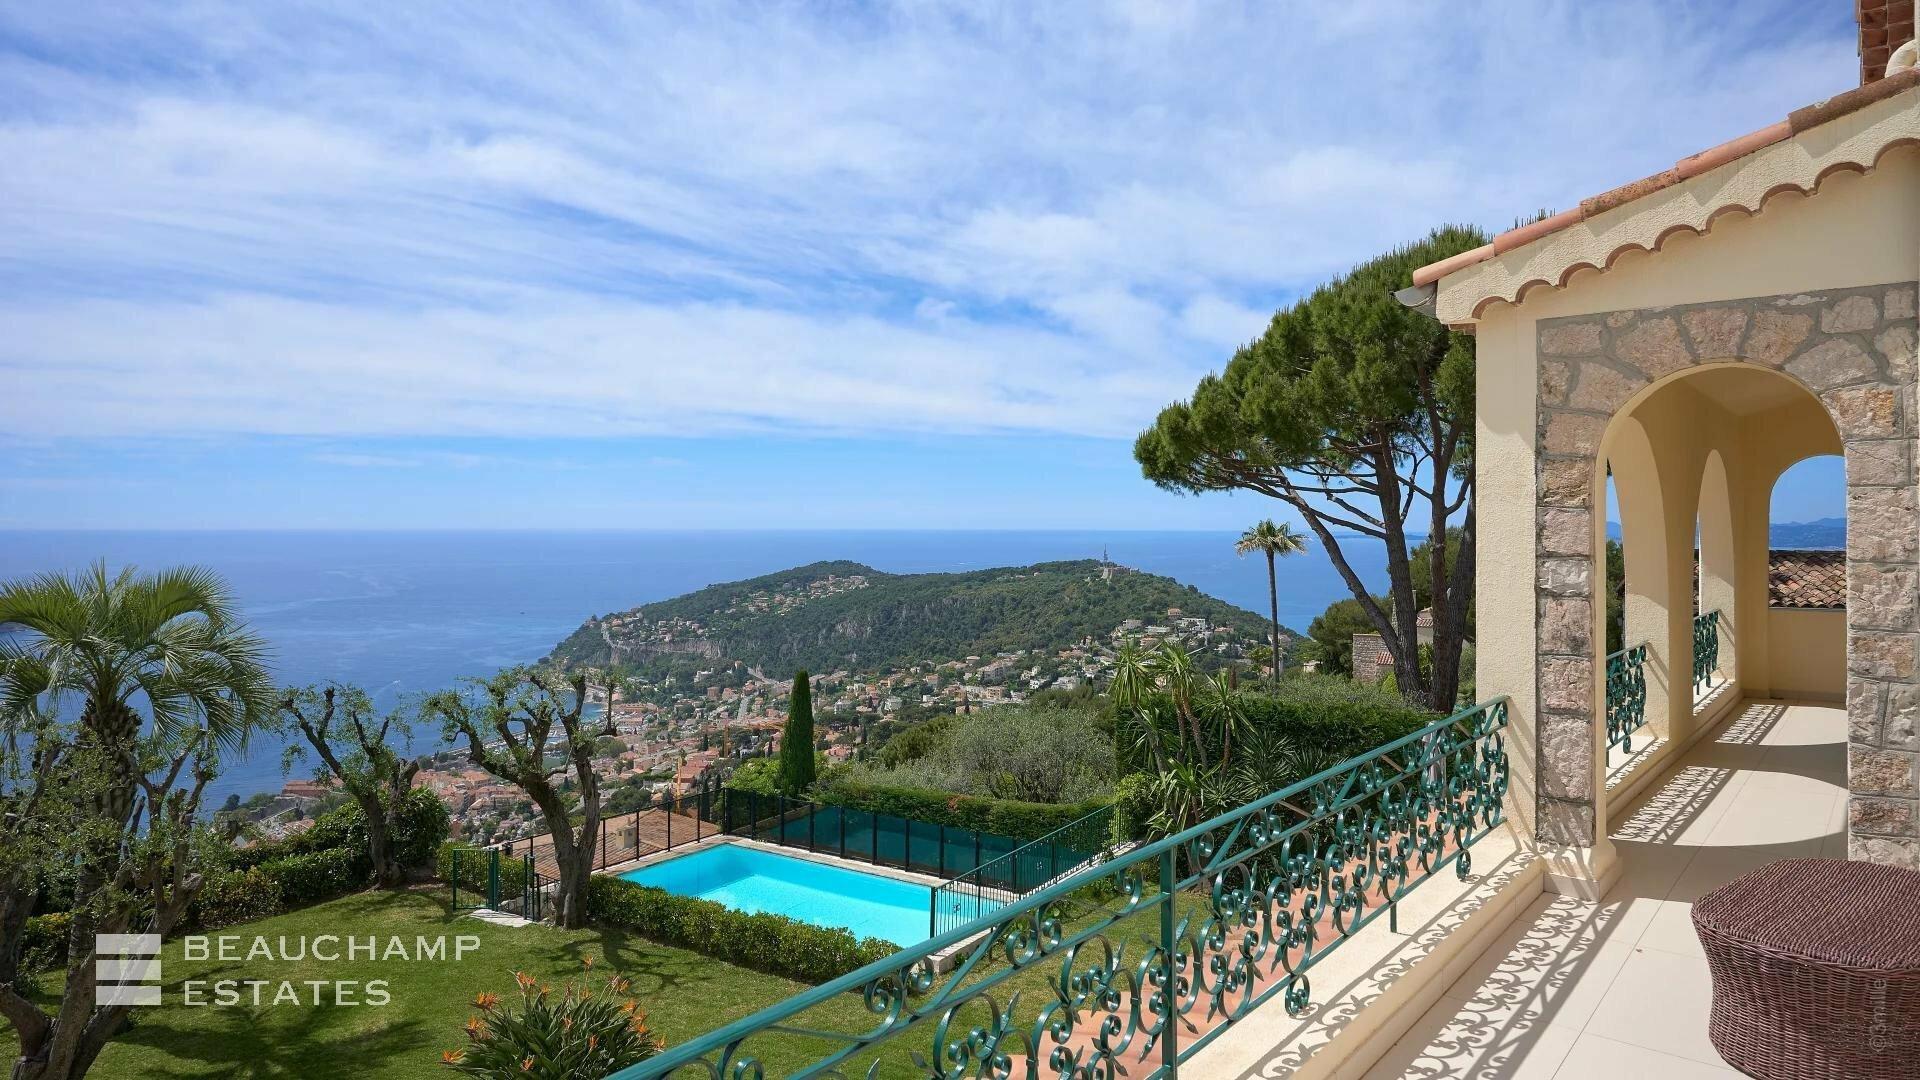 Villa in Nice, Provence-Alpes-Côte d'Azur, France 1 - 11472129